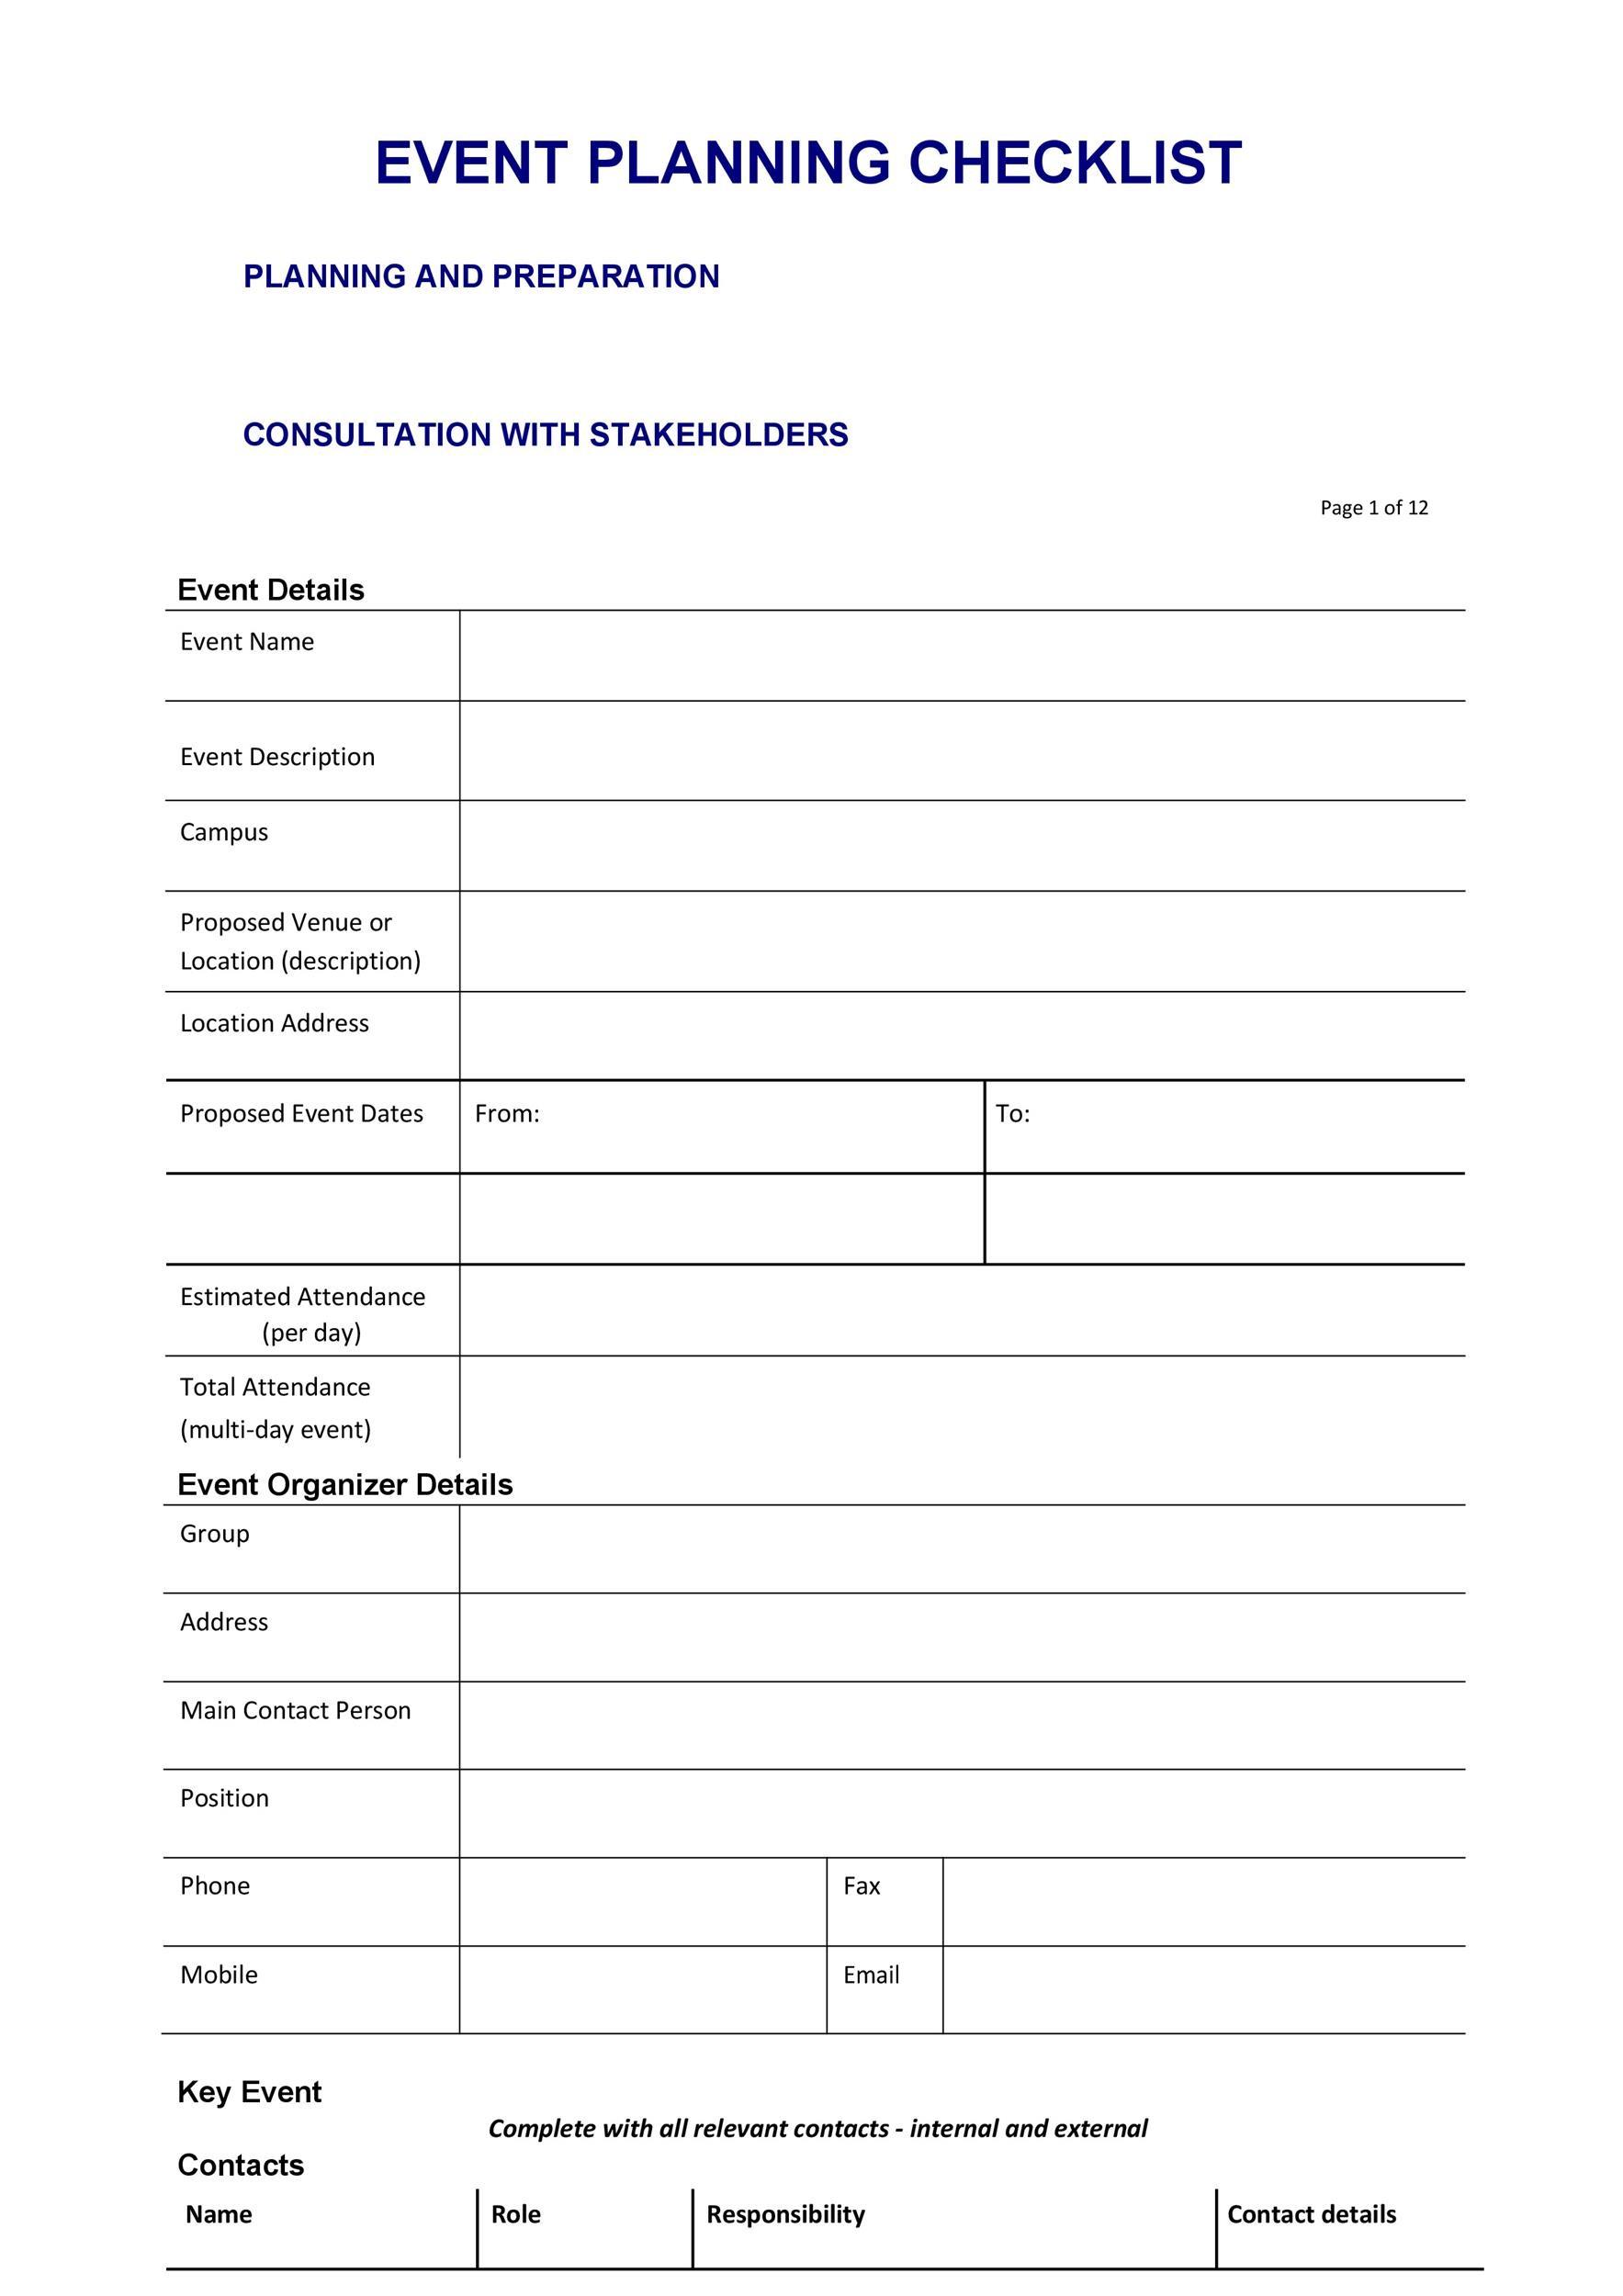 50 Professional Event Planning Checklist Templates ᐅ ...